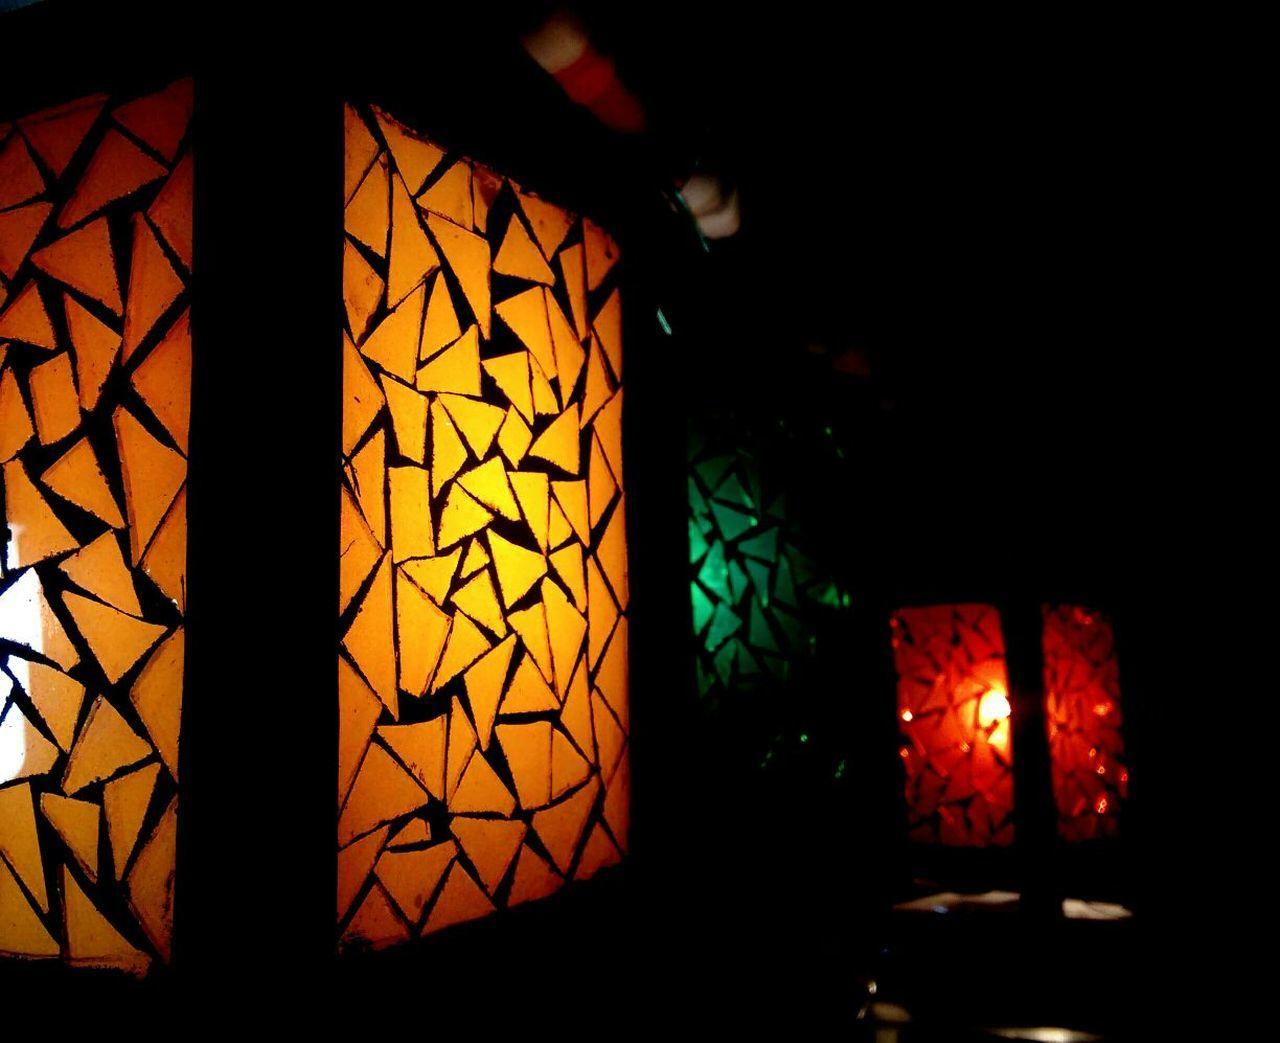 Luminárias 💡✨ Light Fixture Illuminated Lamps Light Lights Iluminated Ilumination No People Night I LOVE PHOTOGRAPHY Simplicity Colors Colorful Colour Of Life Craft Crafts Multi Colored EyeEmBestPics EyeEm Best Shots Brazilian Gallery Brasil Brazil 💡✨💋✨💡🌍✌